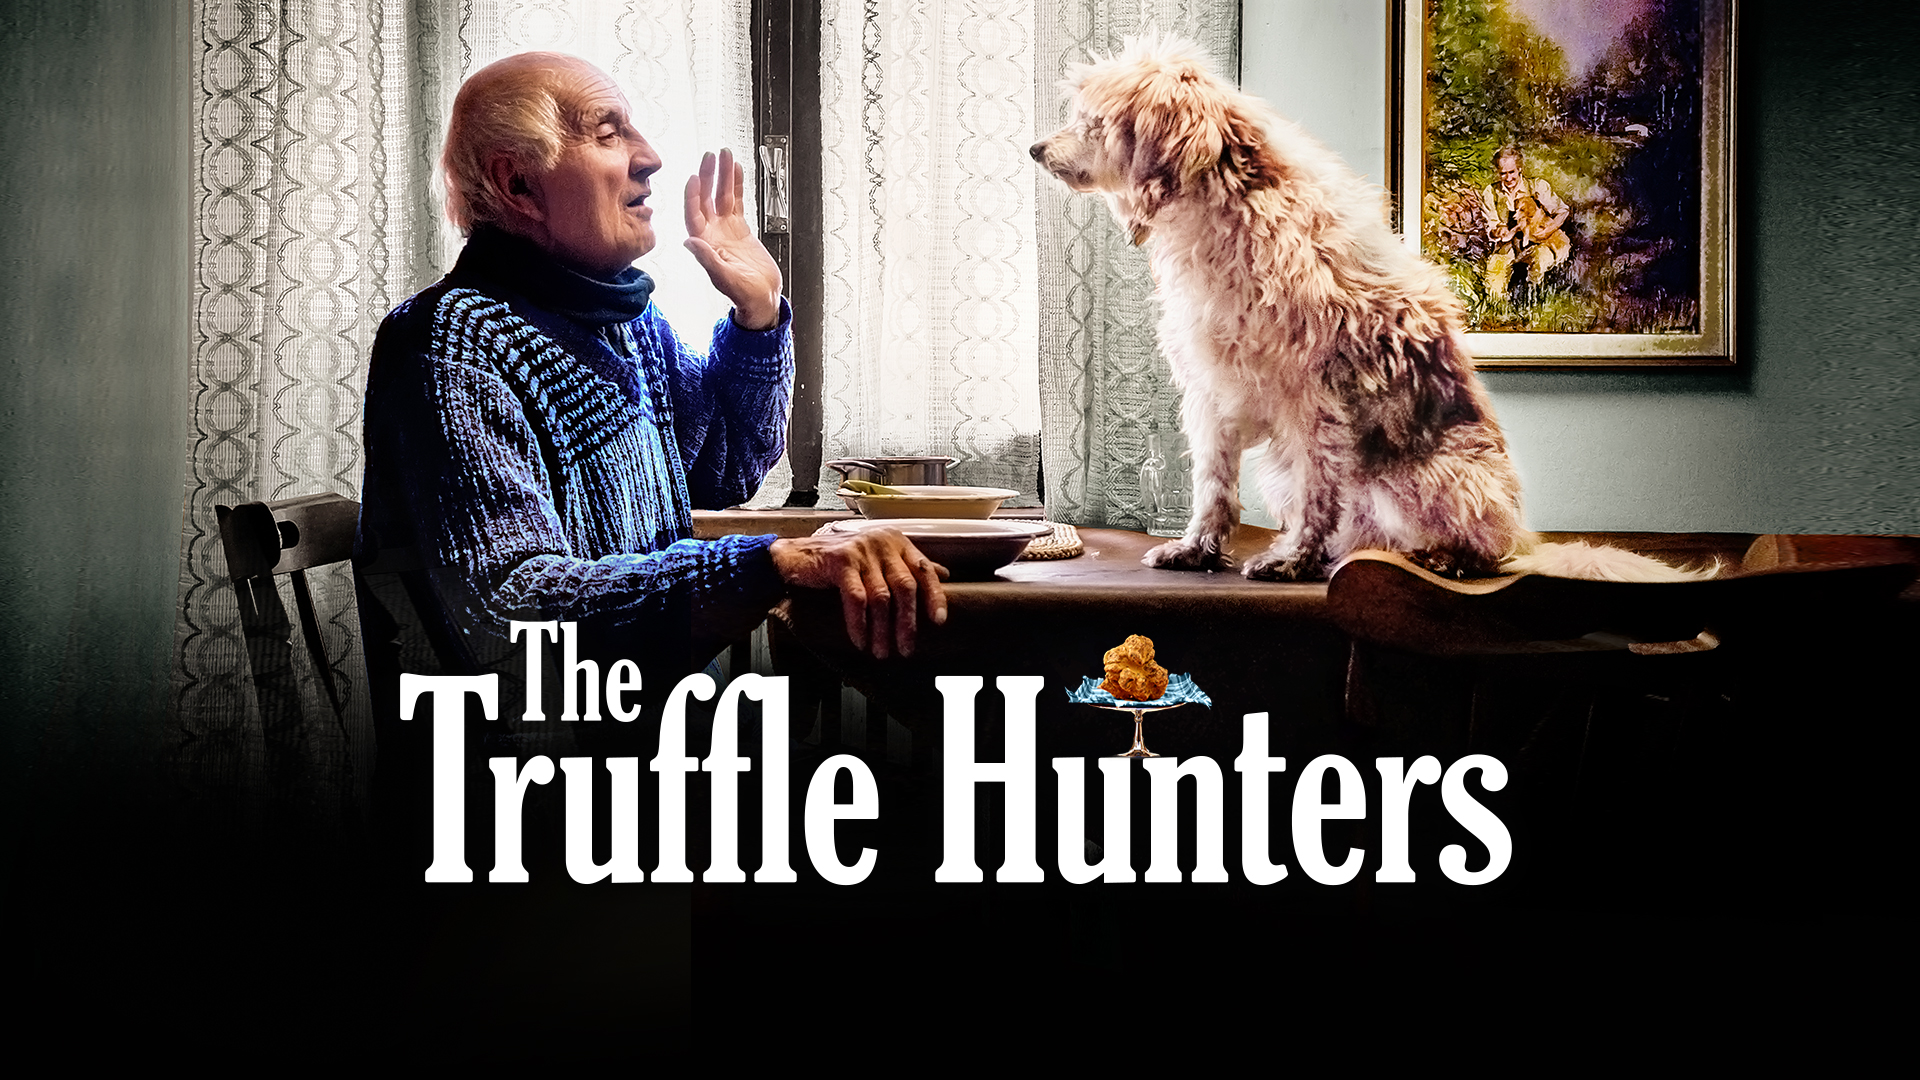 Truffle Hunters, The